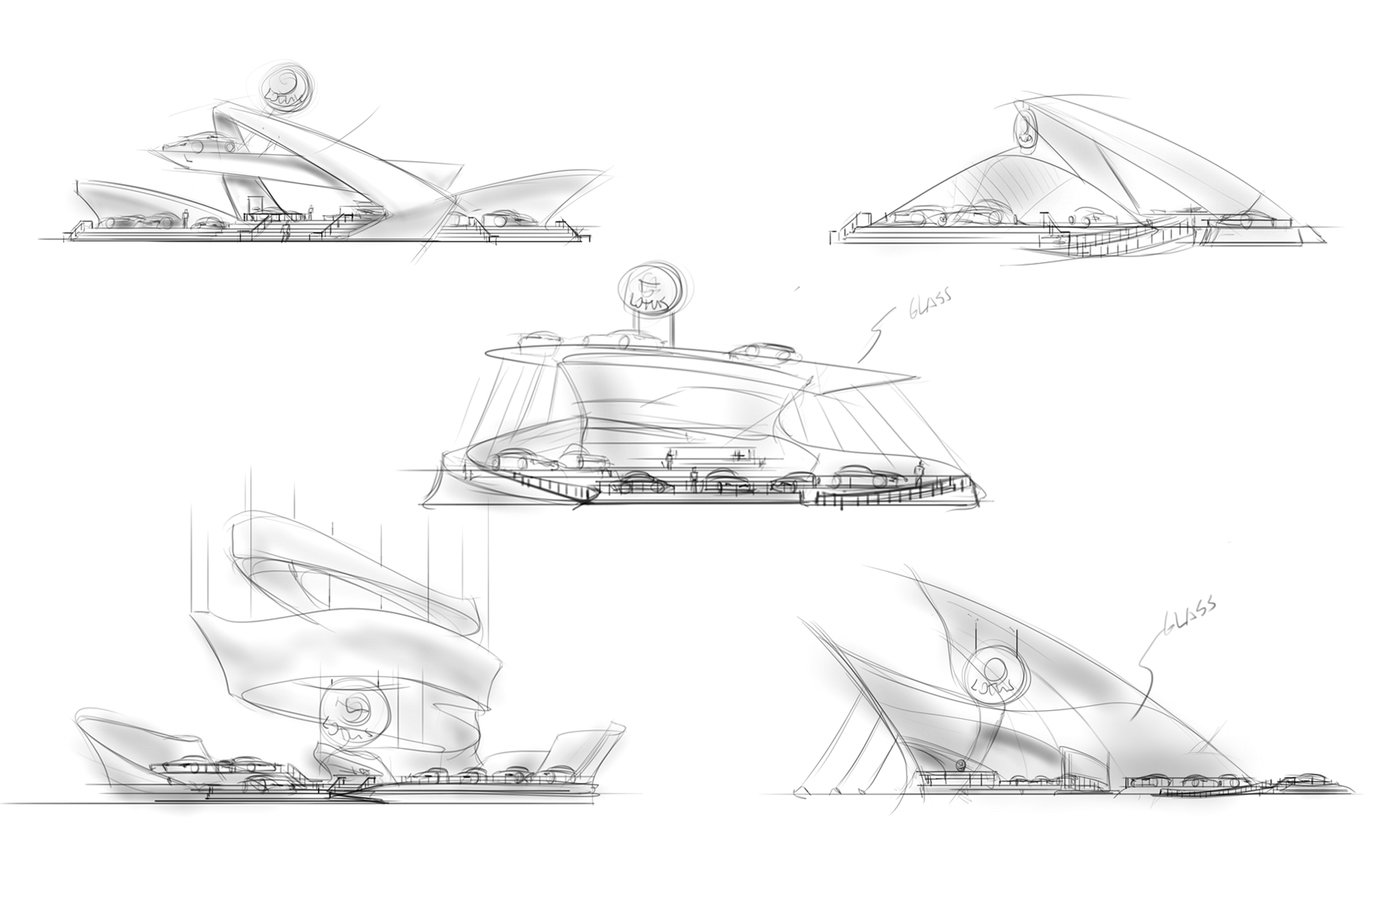 lotus exhibition design concept by scott martin at